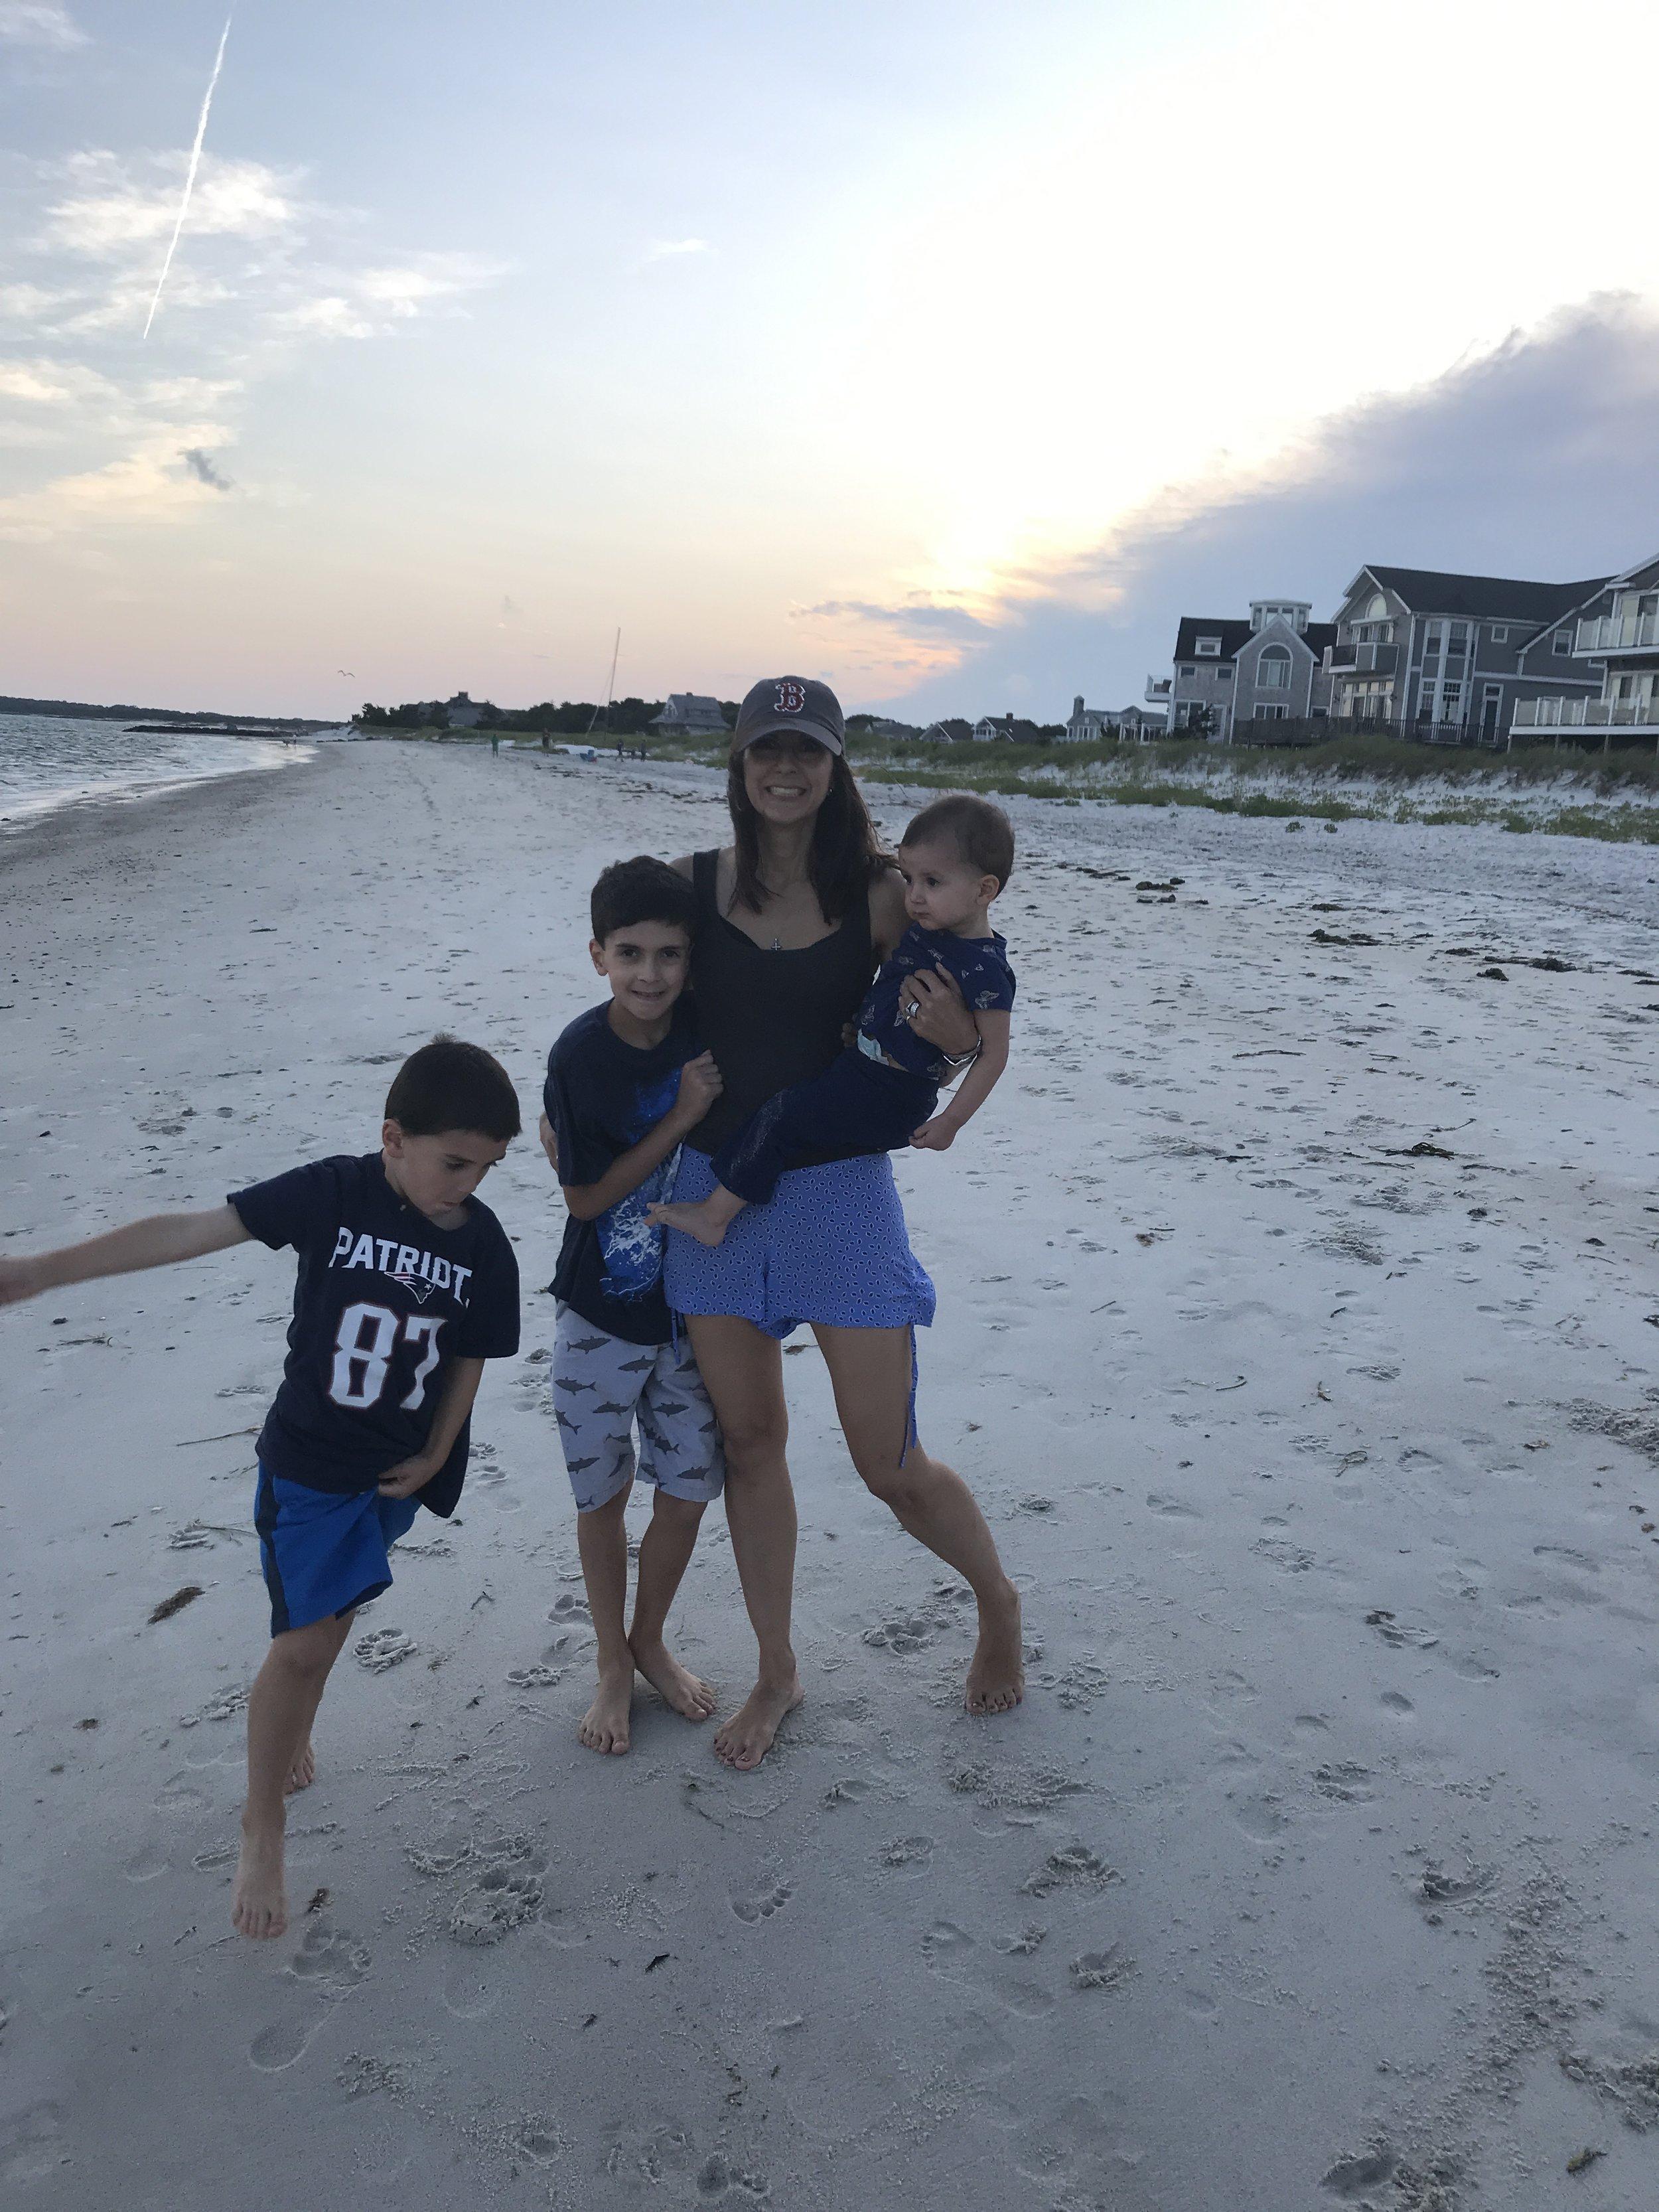 Summer fun 2019 Cape Cod